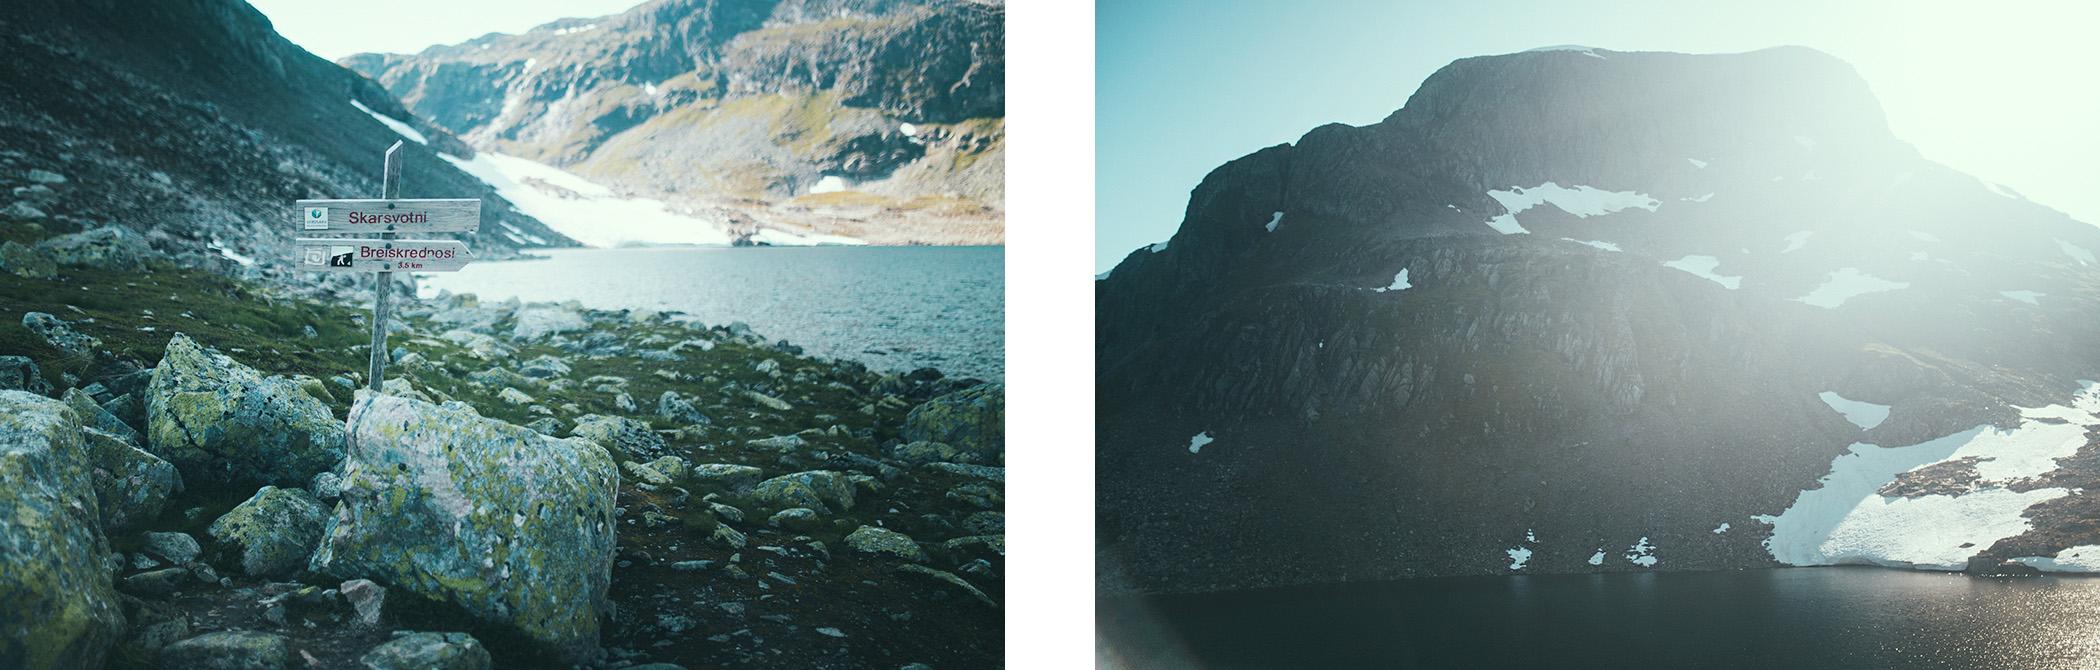 Breiskrednosi, szlak, Norwegia